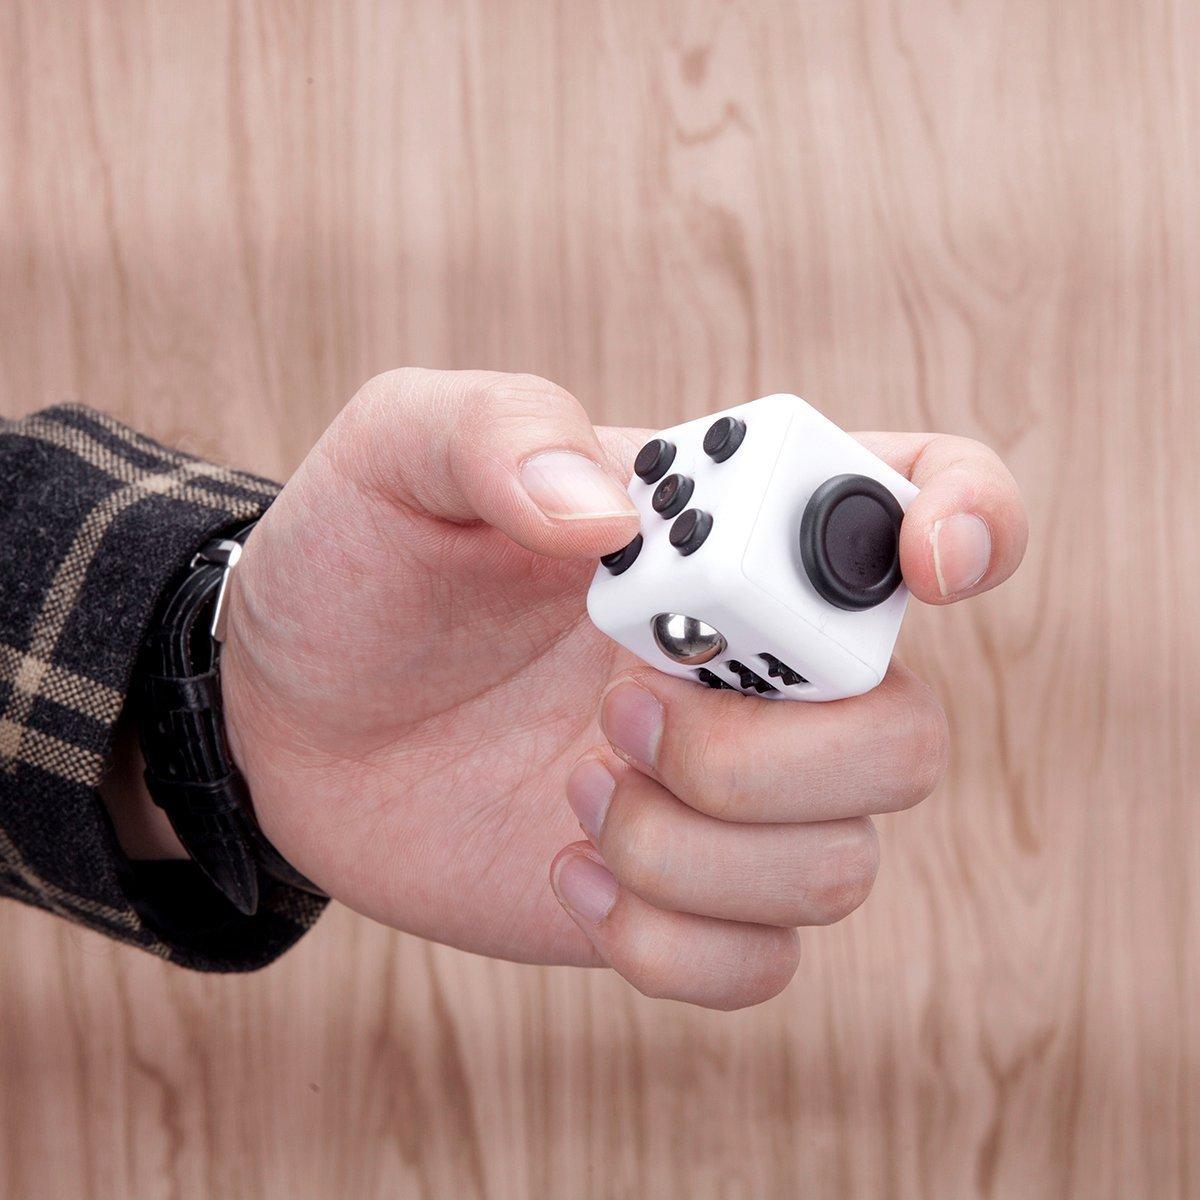 White Black Fidget Cube Toys Original Quality Puzzles & Magic Cubes Anti Stress Reliever Gift